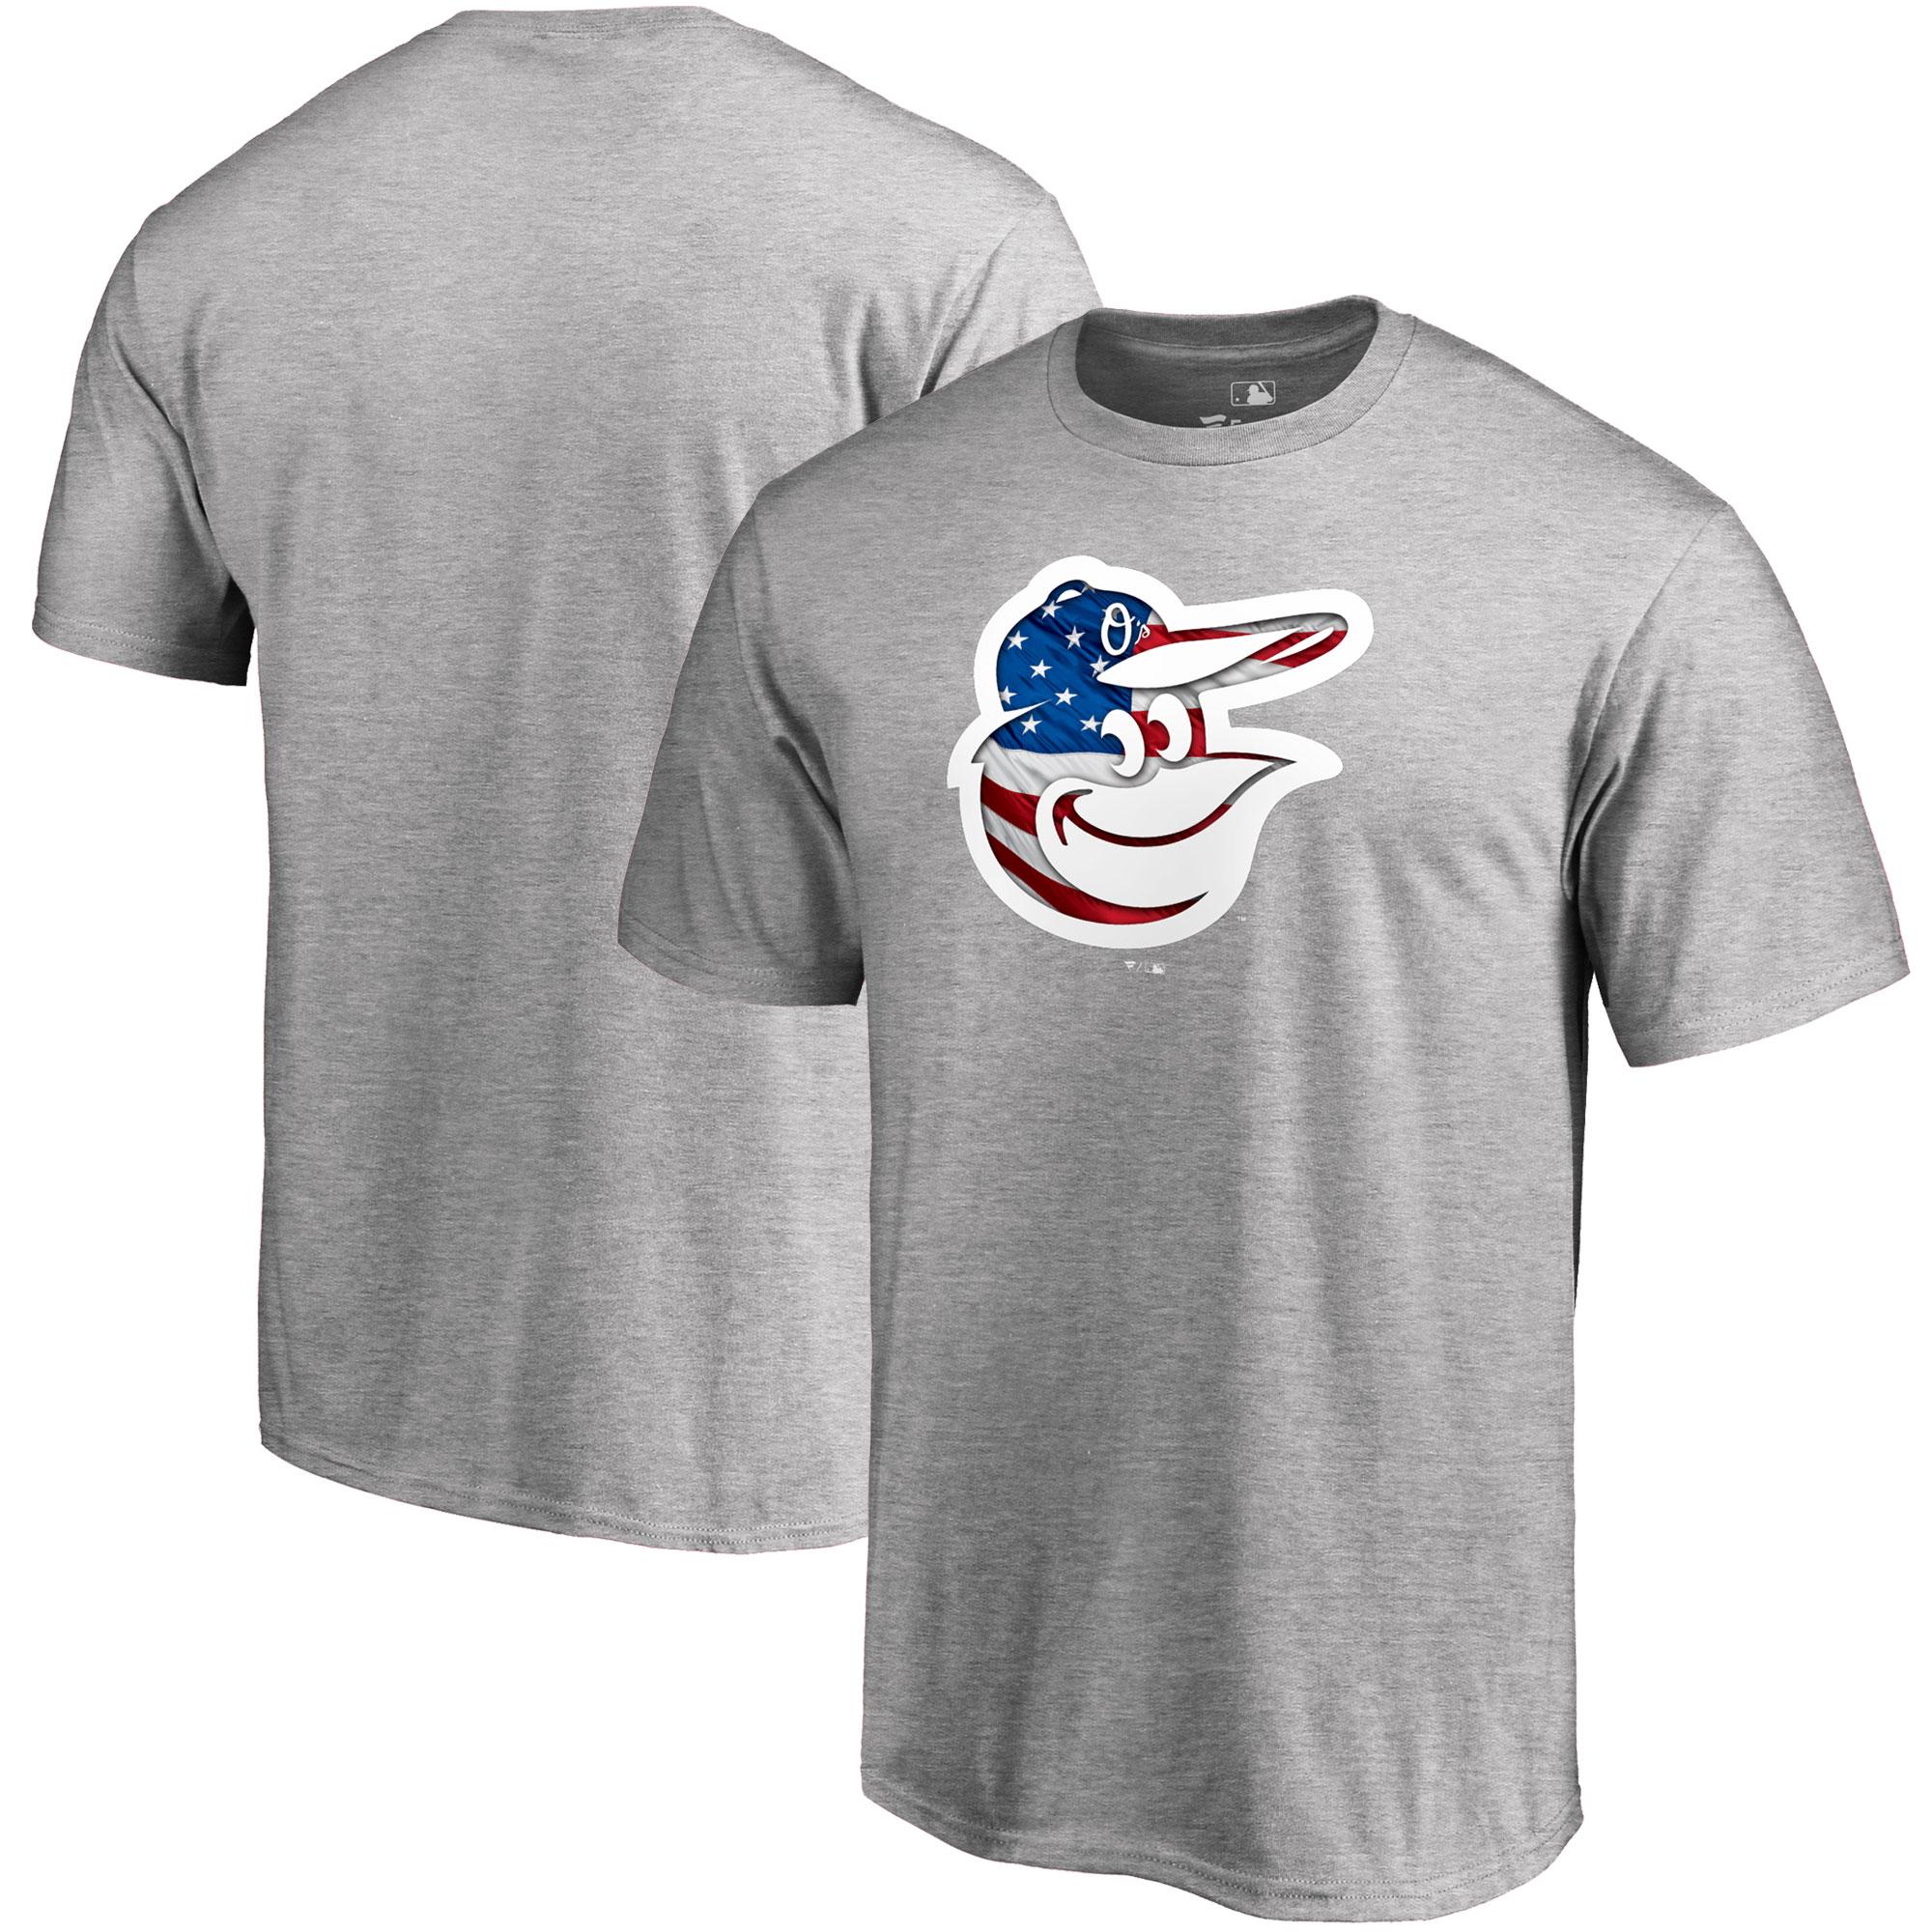 Baltimore Orioles Fanatics Branded 2018 Stars & Stripes Banner Wave Logo T-Shirt - Heather Gray